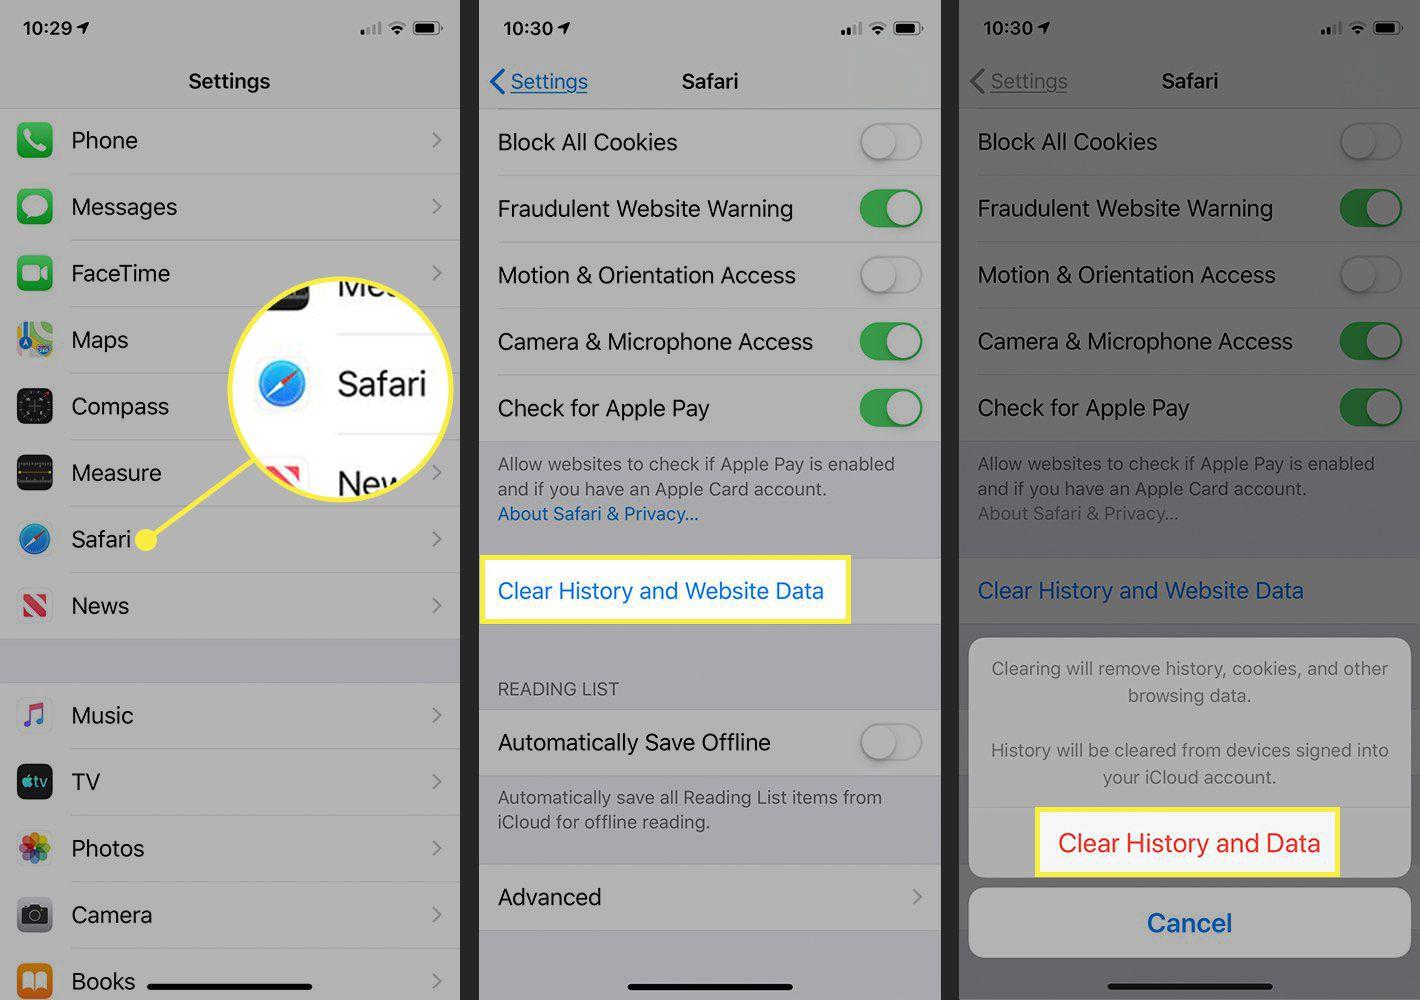 Screenshots of an iPhone showing how to delete Safari's data